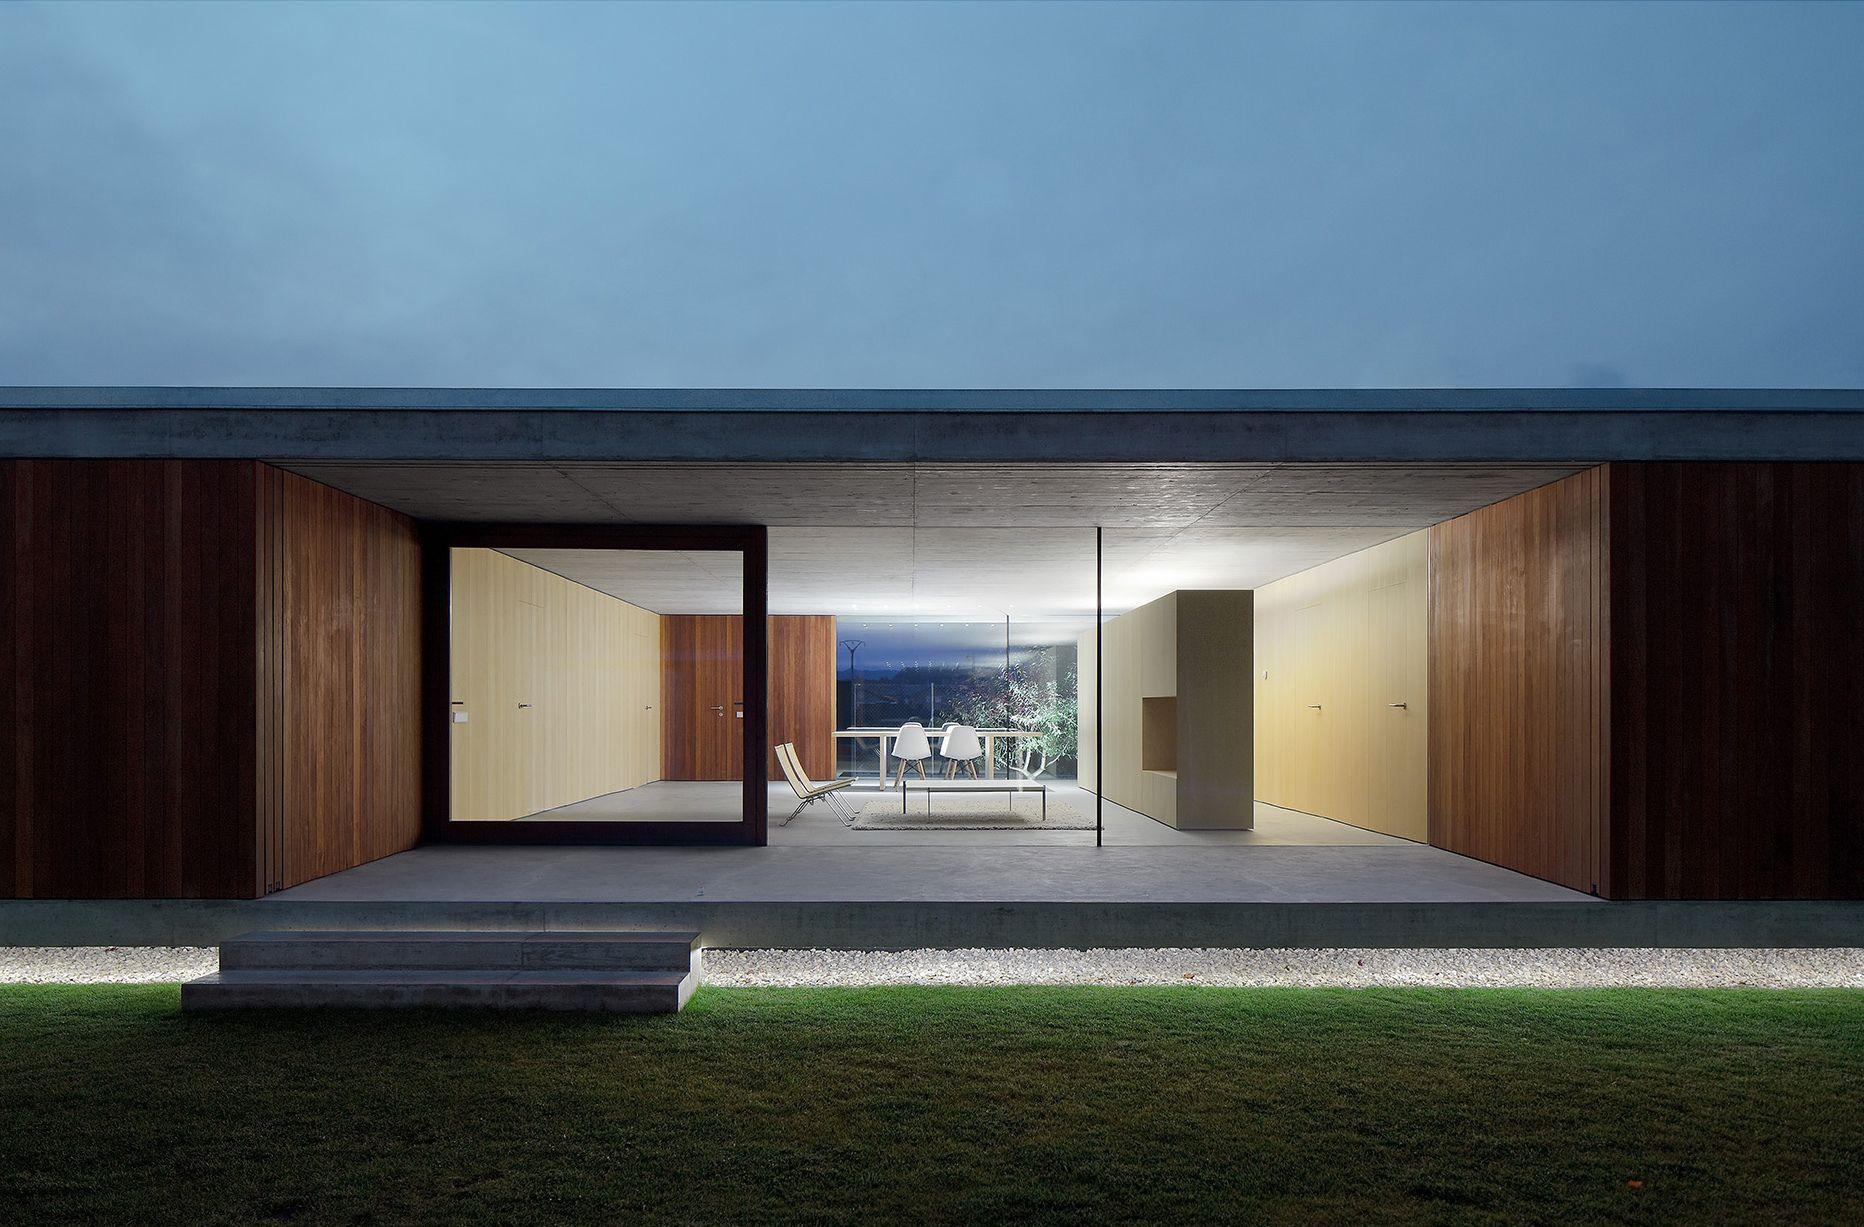 Residência Unifamiliar em Villarcayo / Pereda Pérez Arquitectos